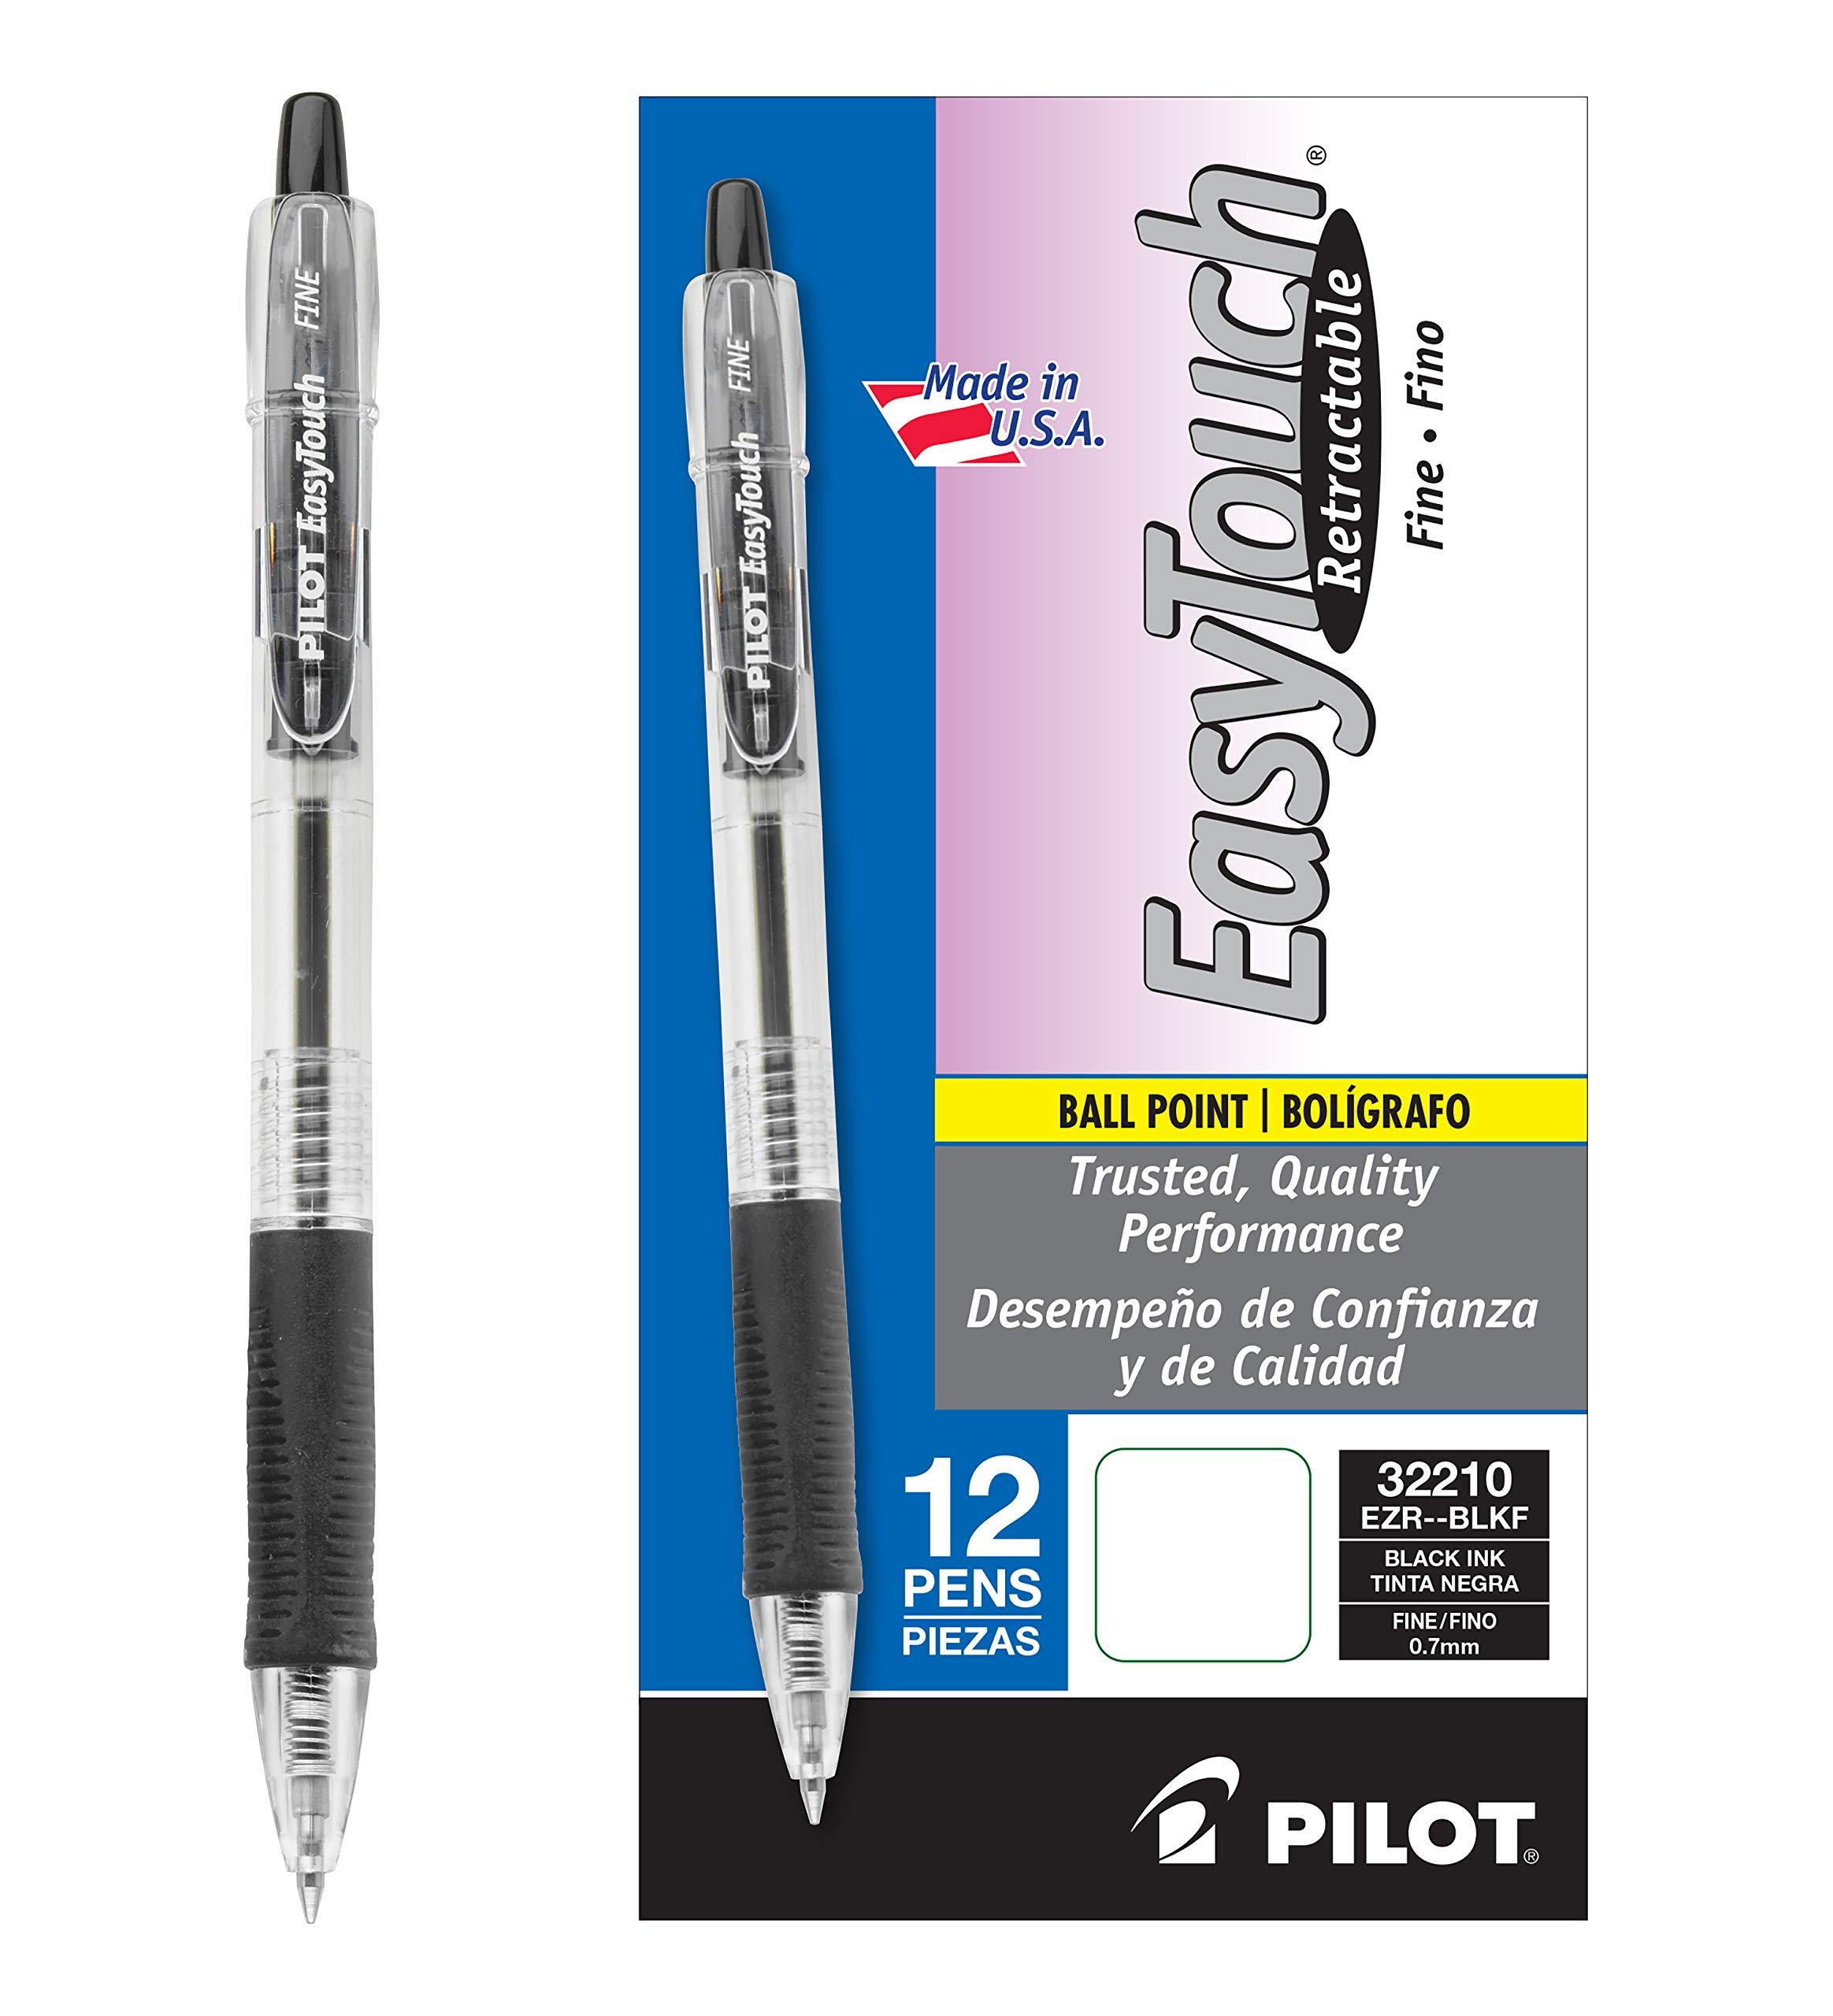 PILOT EasyTouch Refillable & Retractable Ballpoint Pens, Fine Point, Black Ink, 12-Pack (32210)